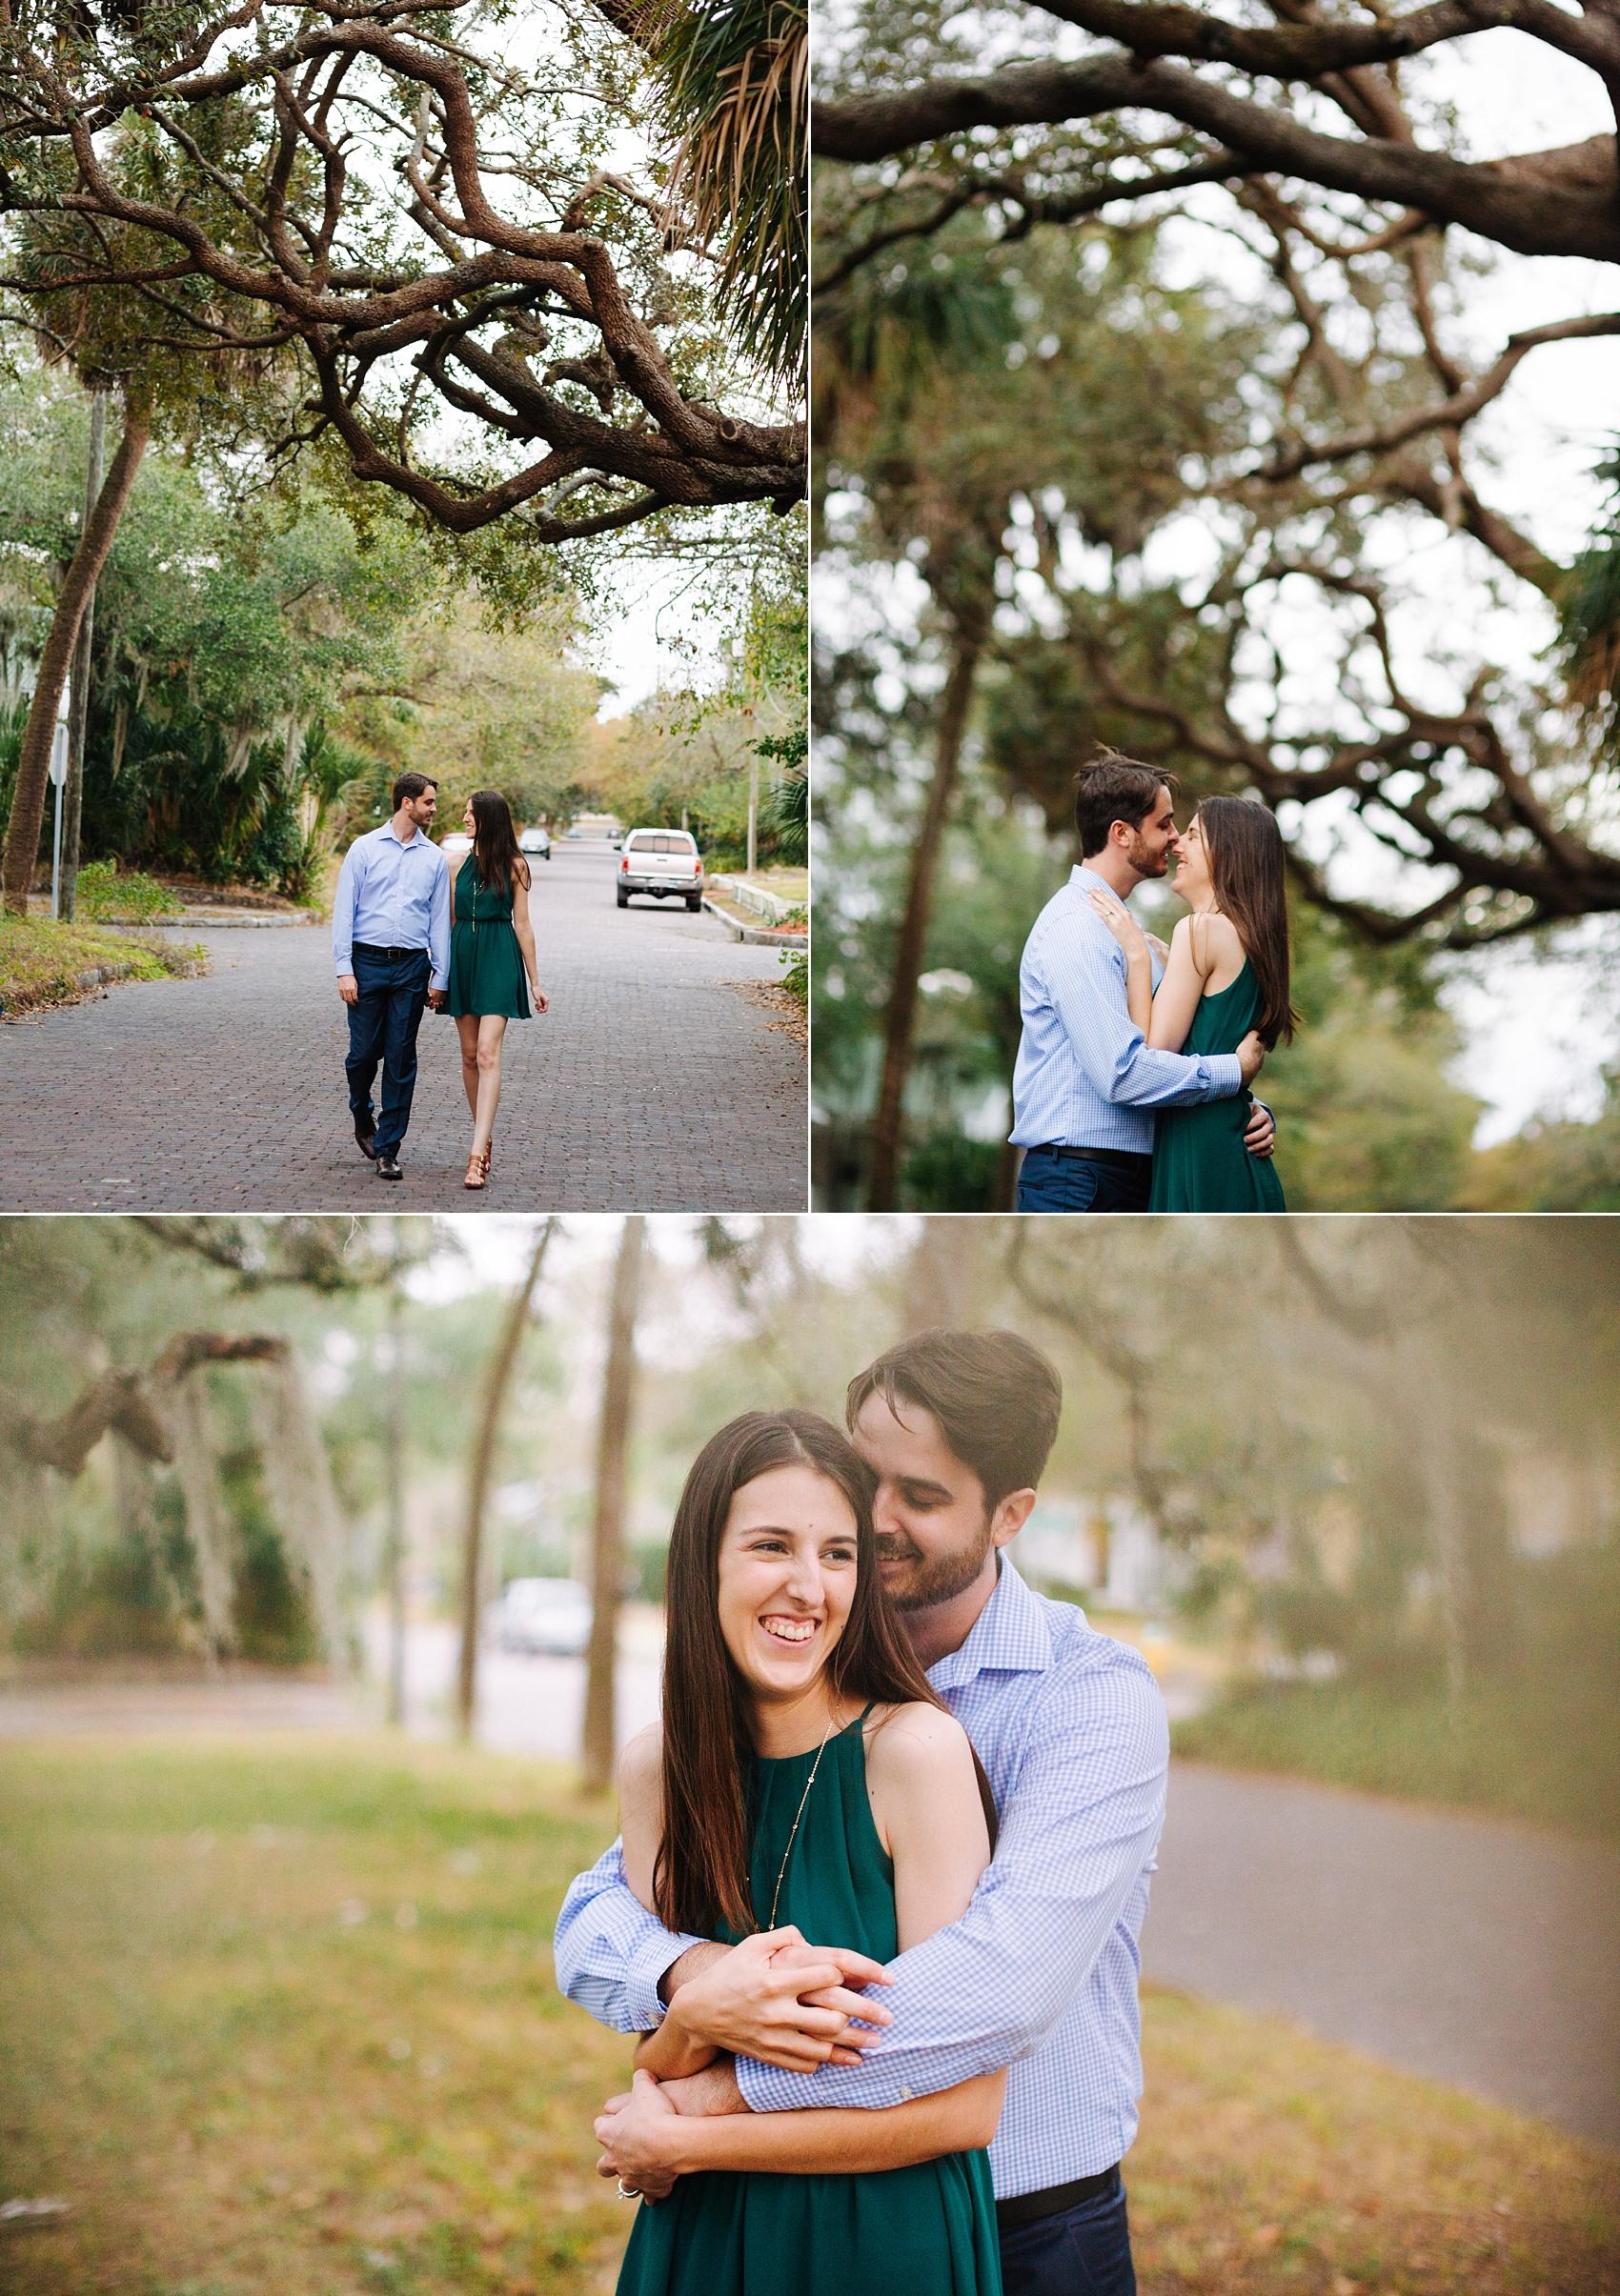 Jake & Katie Photography Seminole Heights Engagement Photos David & Cailyn-018.jpg